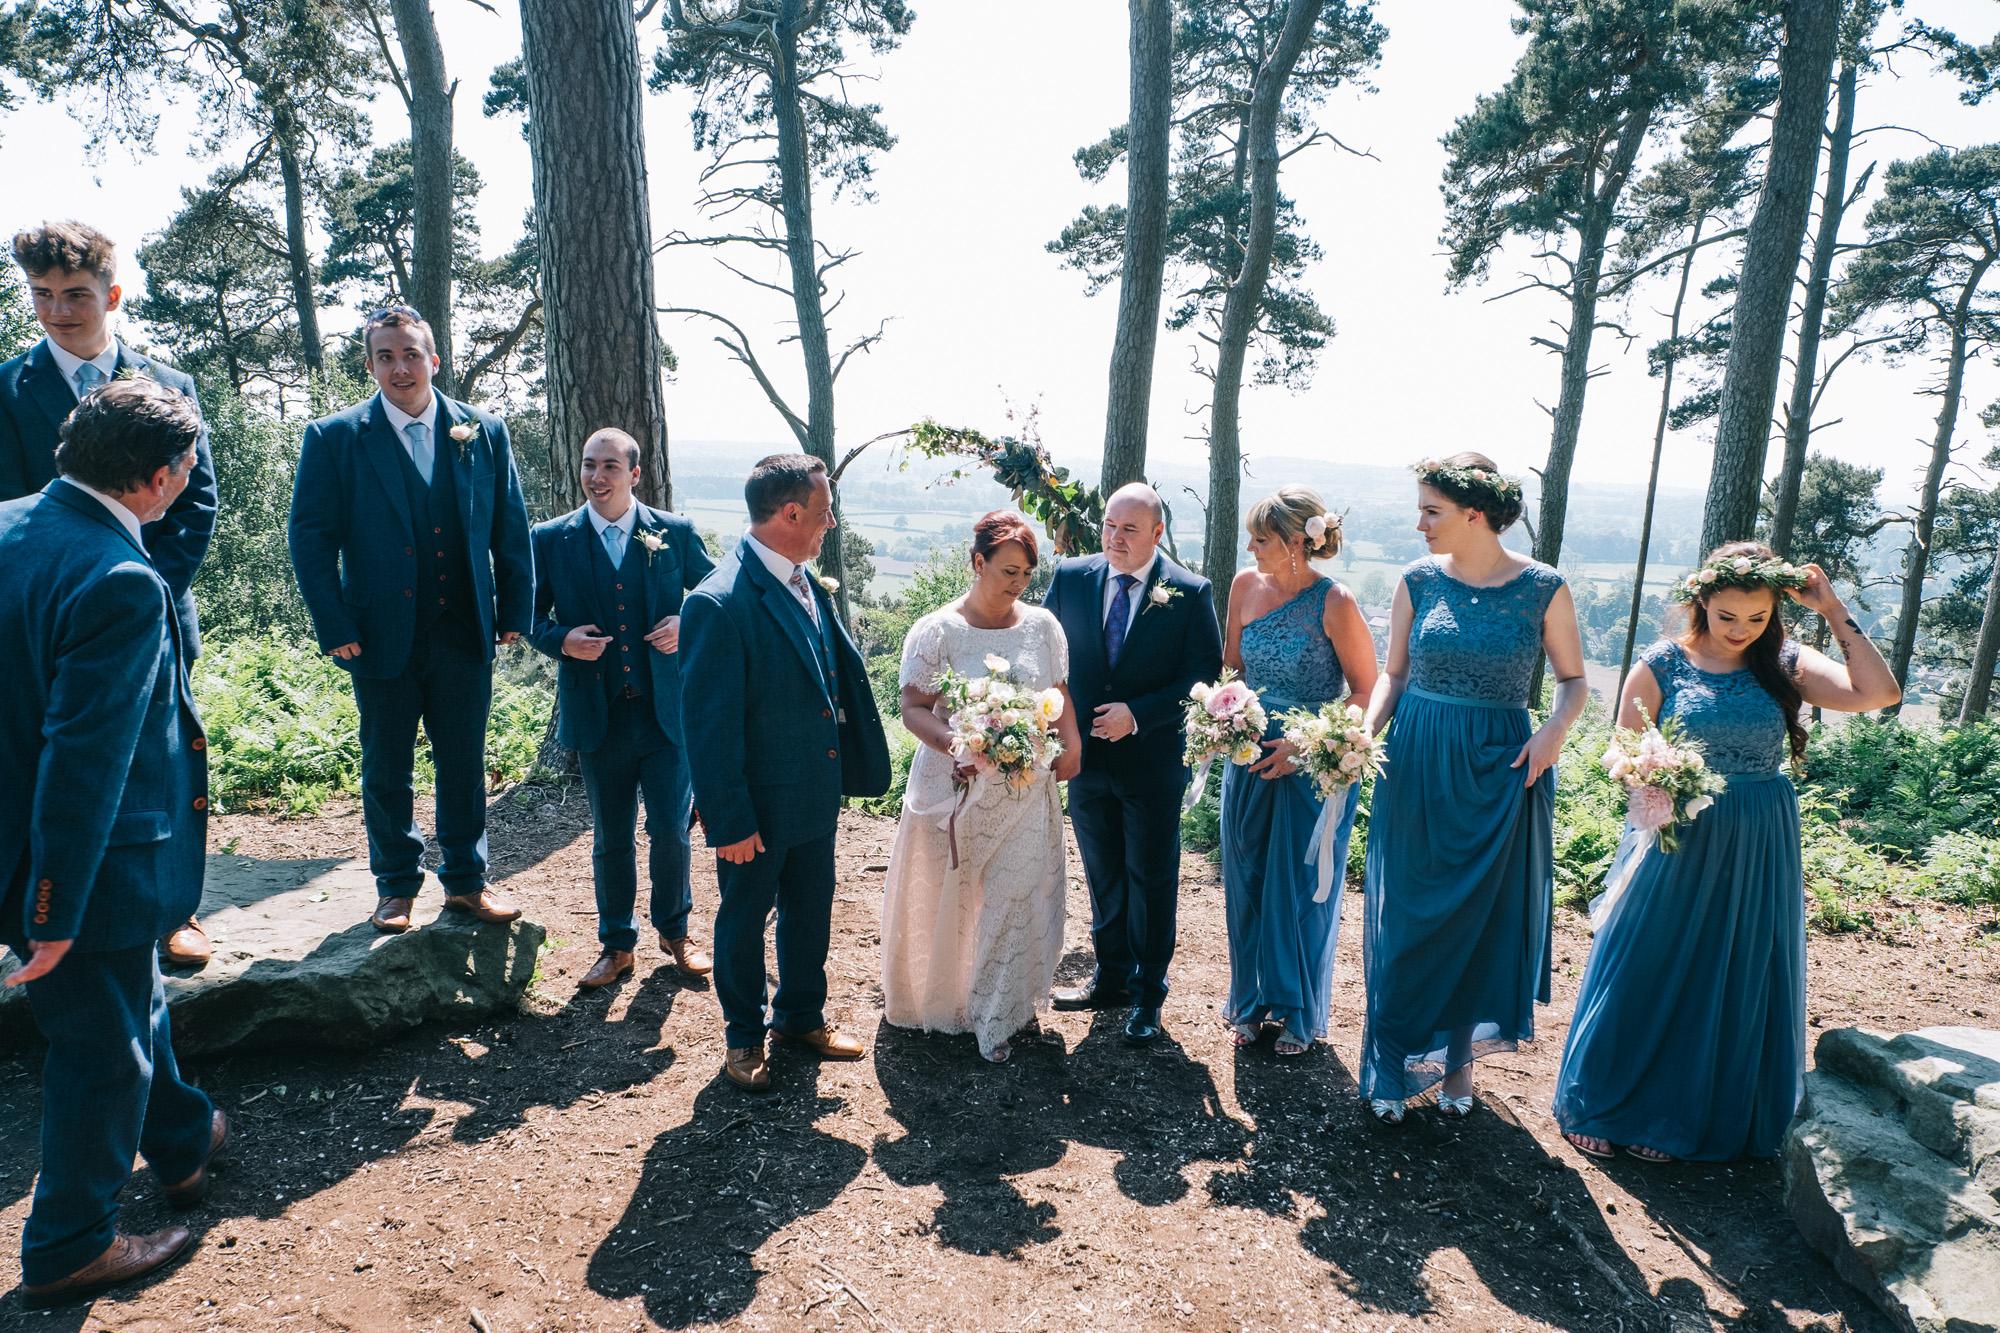 Bridgette-Dahlia-Blush-Silk-Lace-Wedding-Dress-Kate-Beaumont-Sheffield-Ivory-Fayre-11.jpg